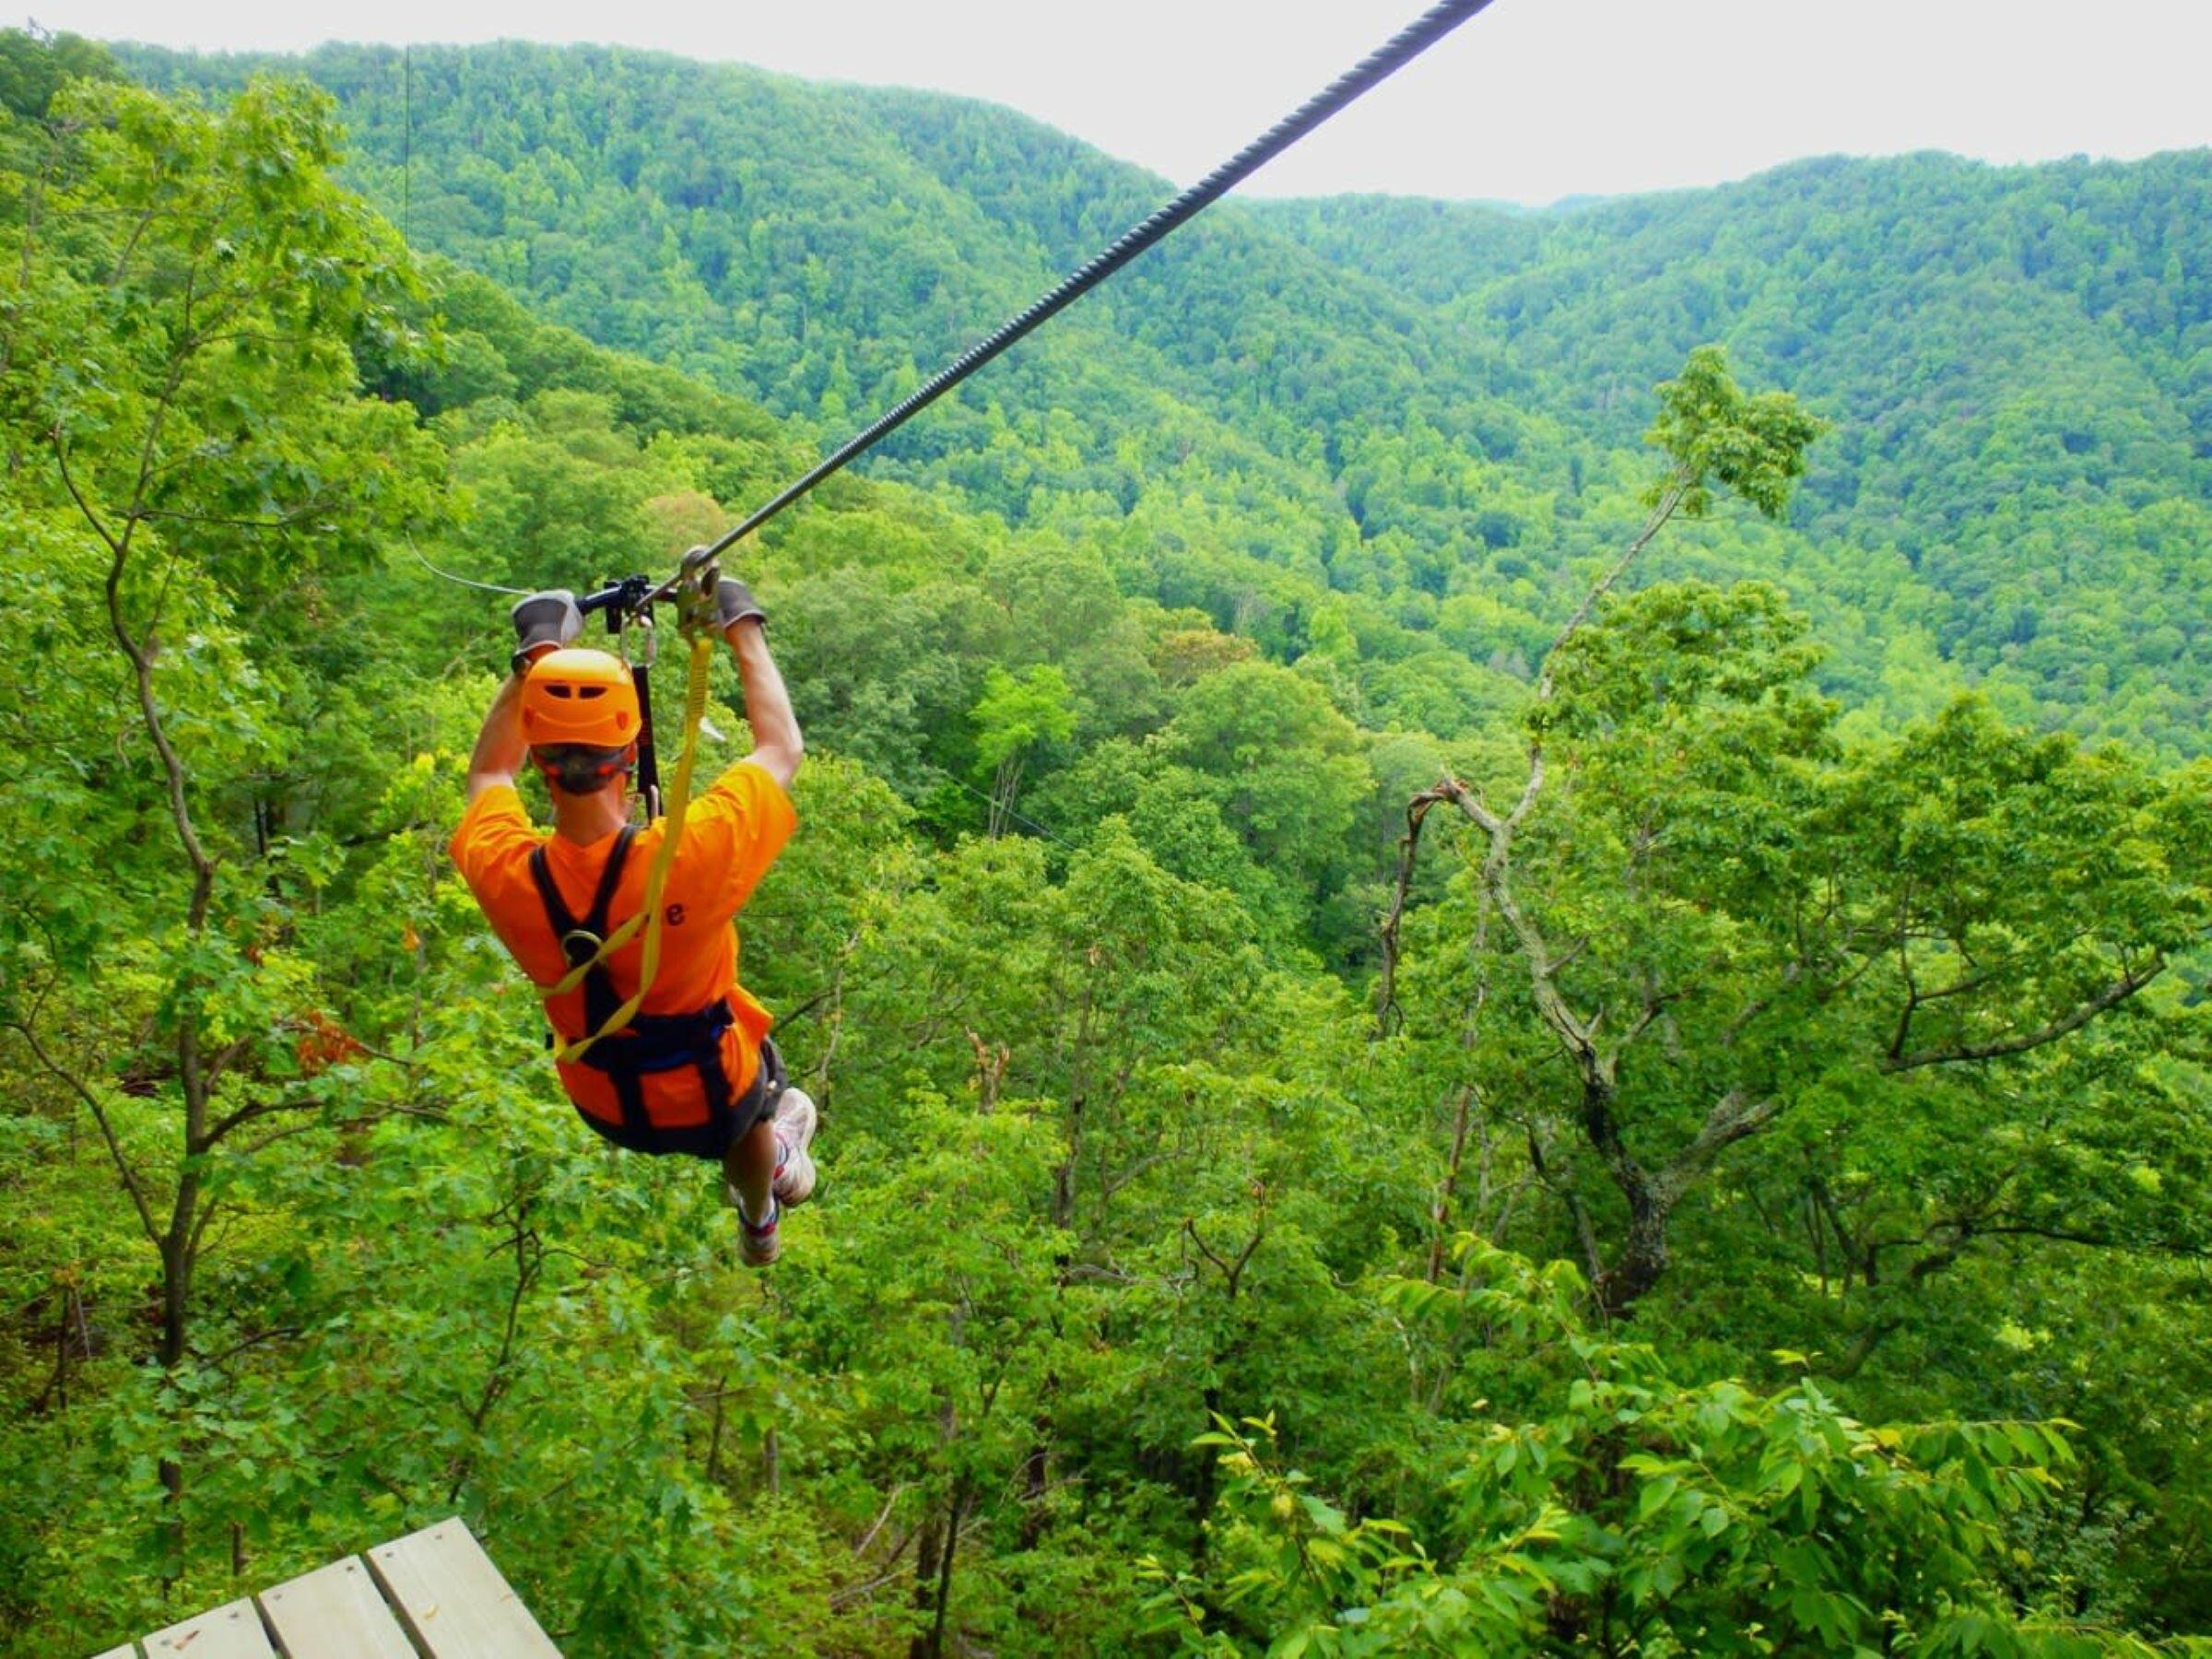 A man on a zipline at The Gorge Zipline near Mountain Inn & Suites